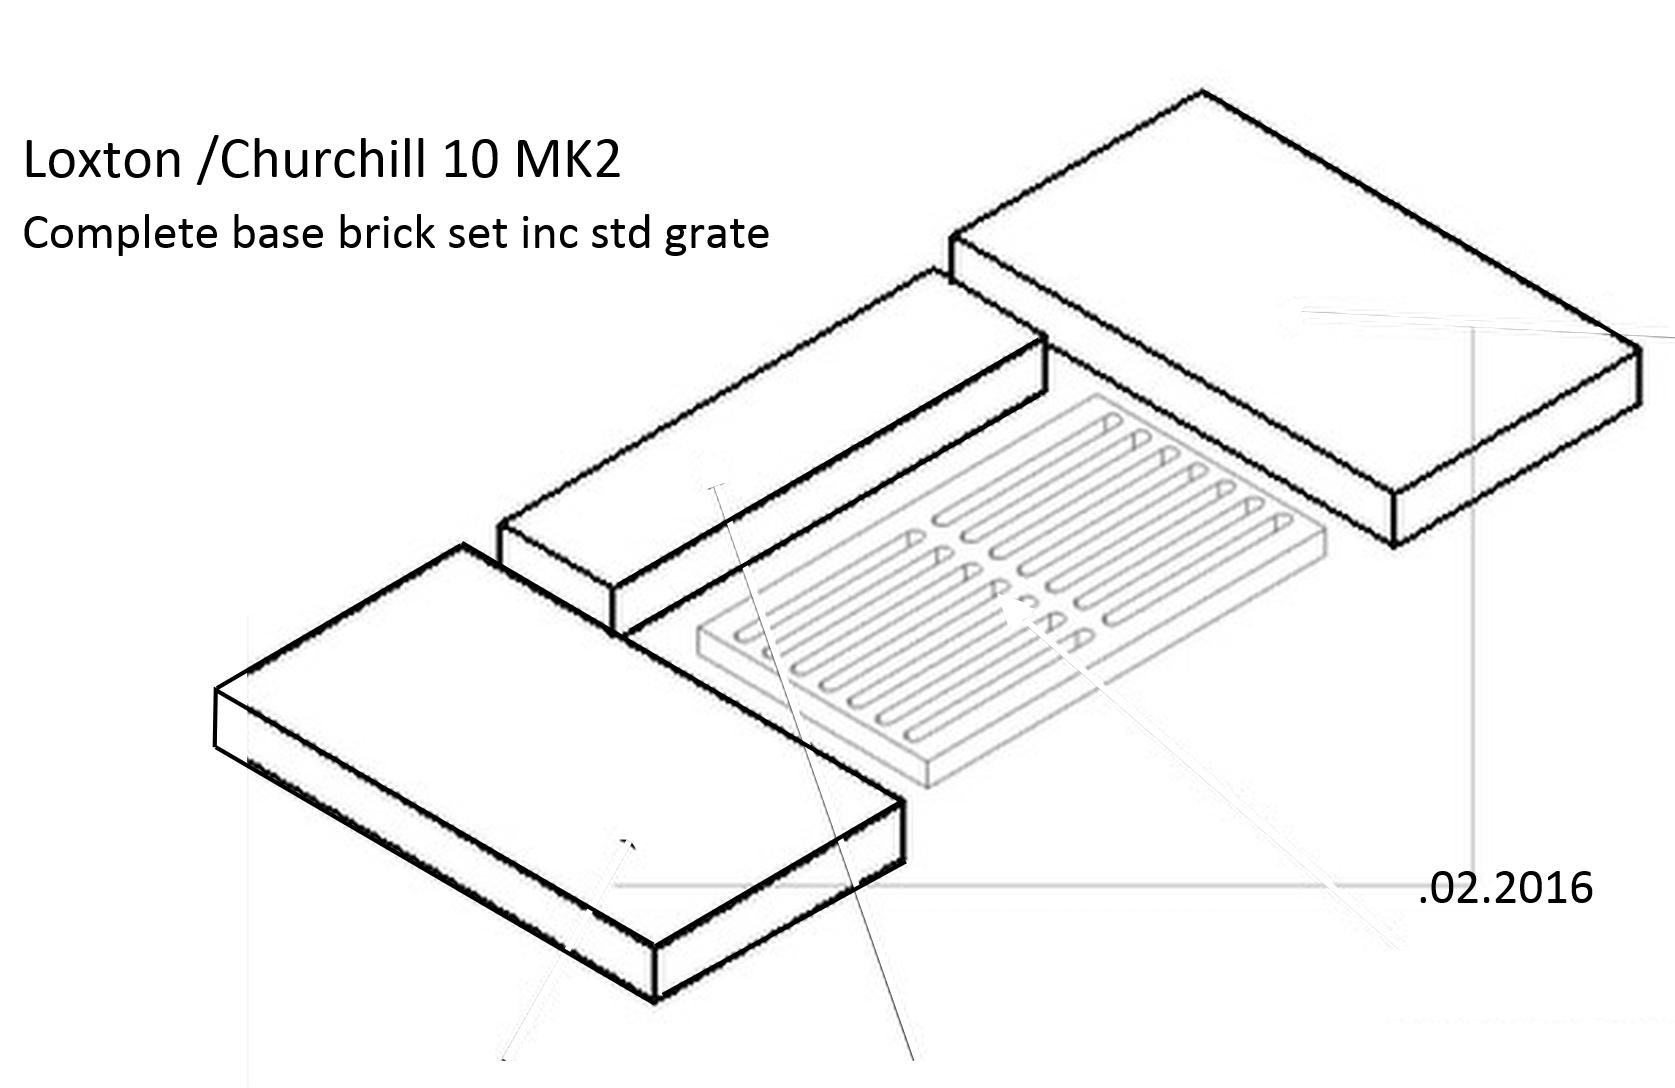 l ch 10kw brick part base set emg grate to plain grate conversion mendip stoves wood. Black Bedroom Furniture Sets. Home Design Ideas